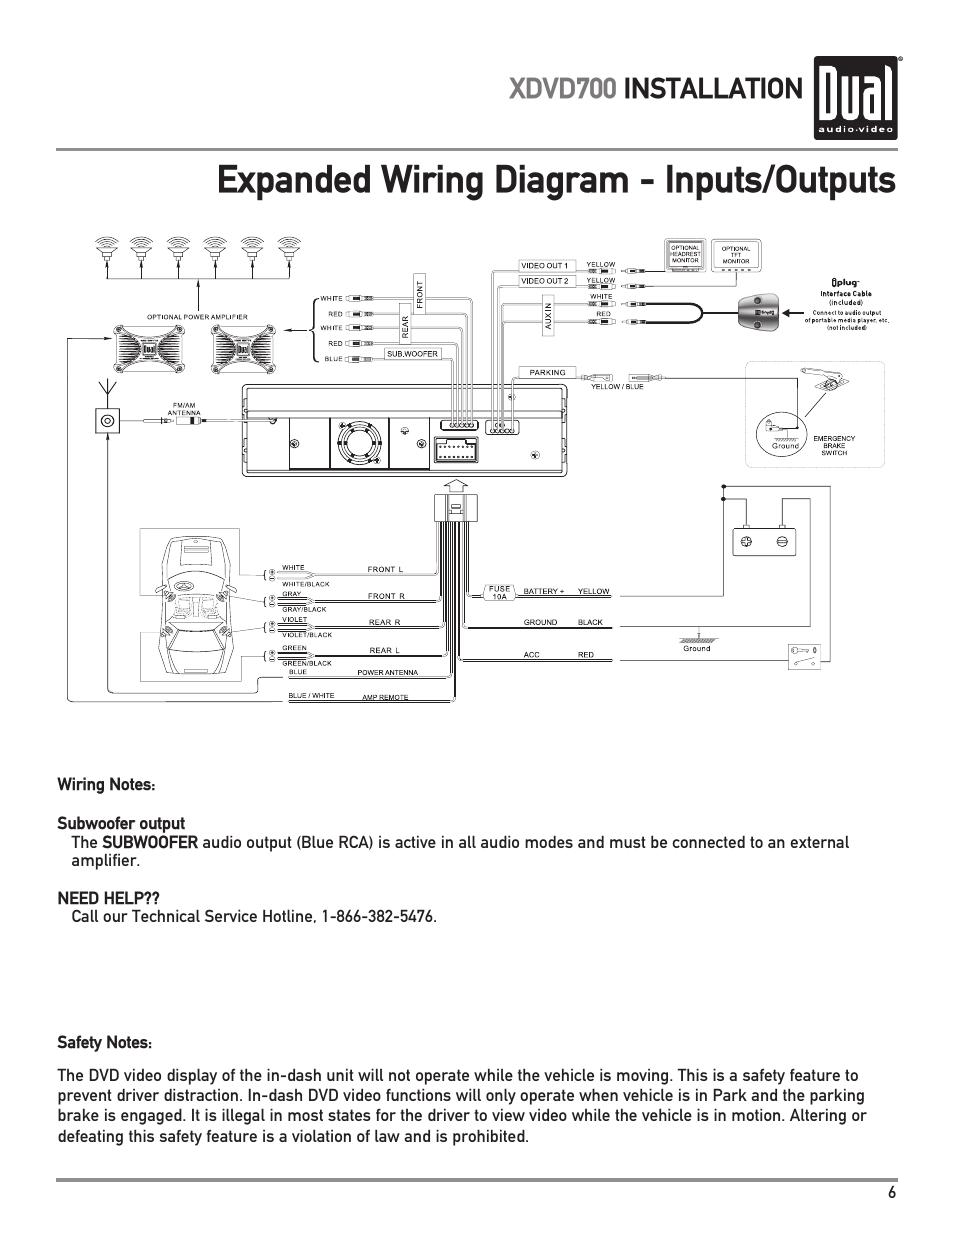 Dual Xd1228 Wiring Diagram   #1 Wiring Diagram Source on